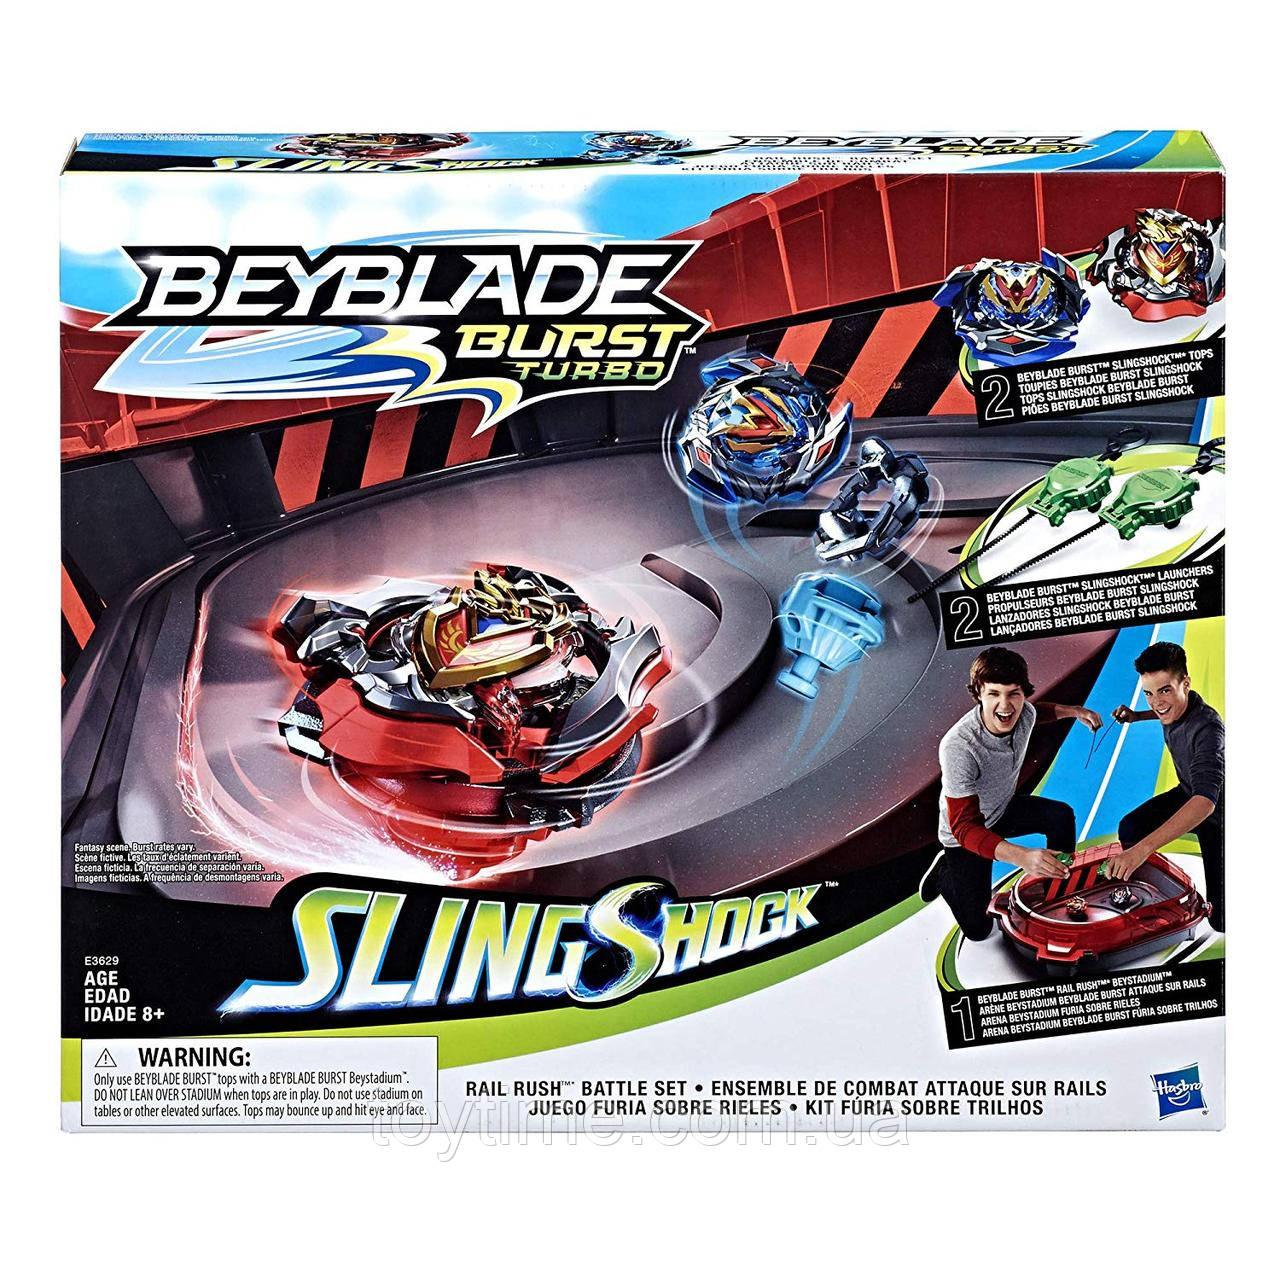 Набор волчков 4 серии с ареной BEYBLADE Burst Turbo Slingshock Rail Rush Battle Set